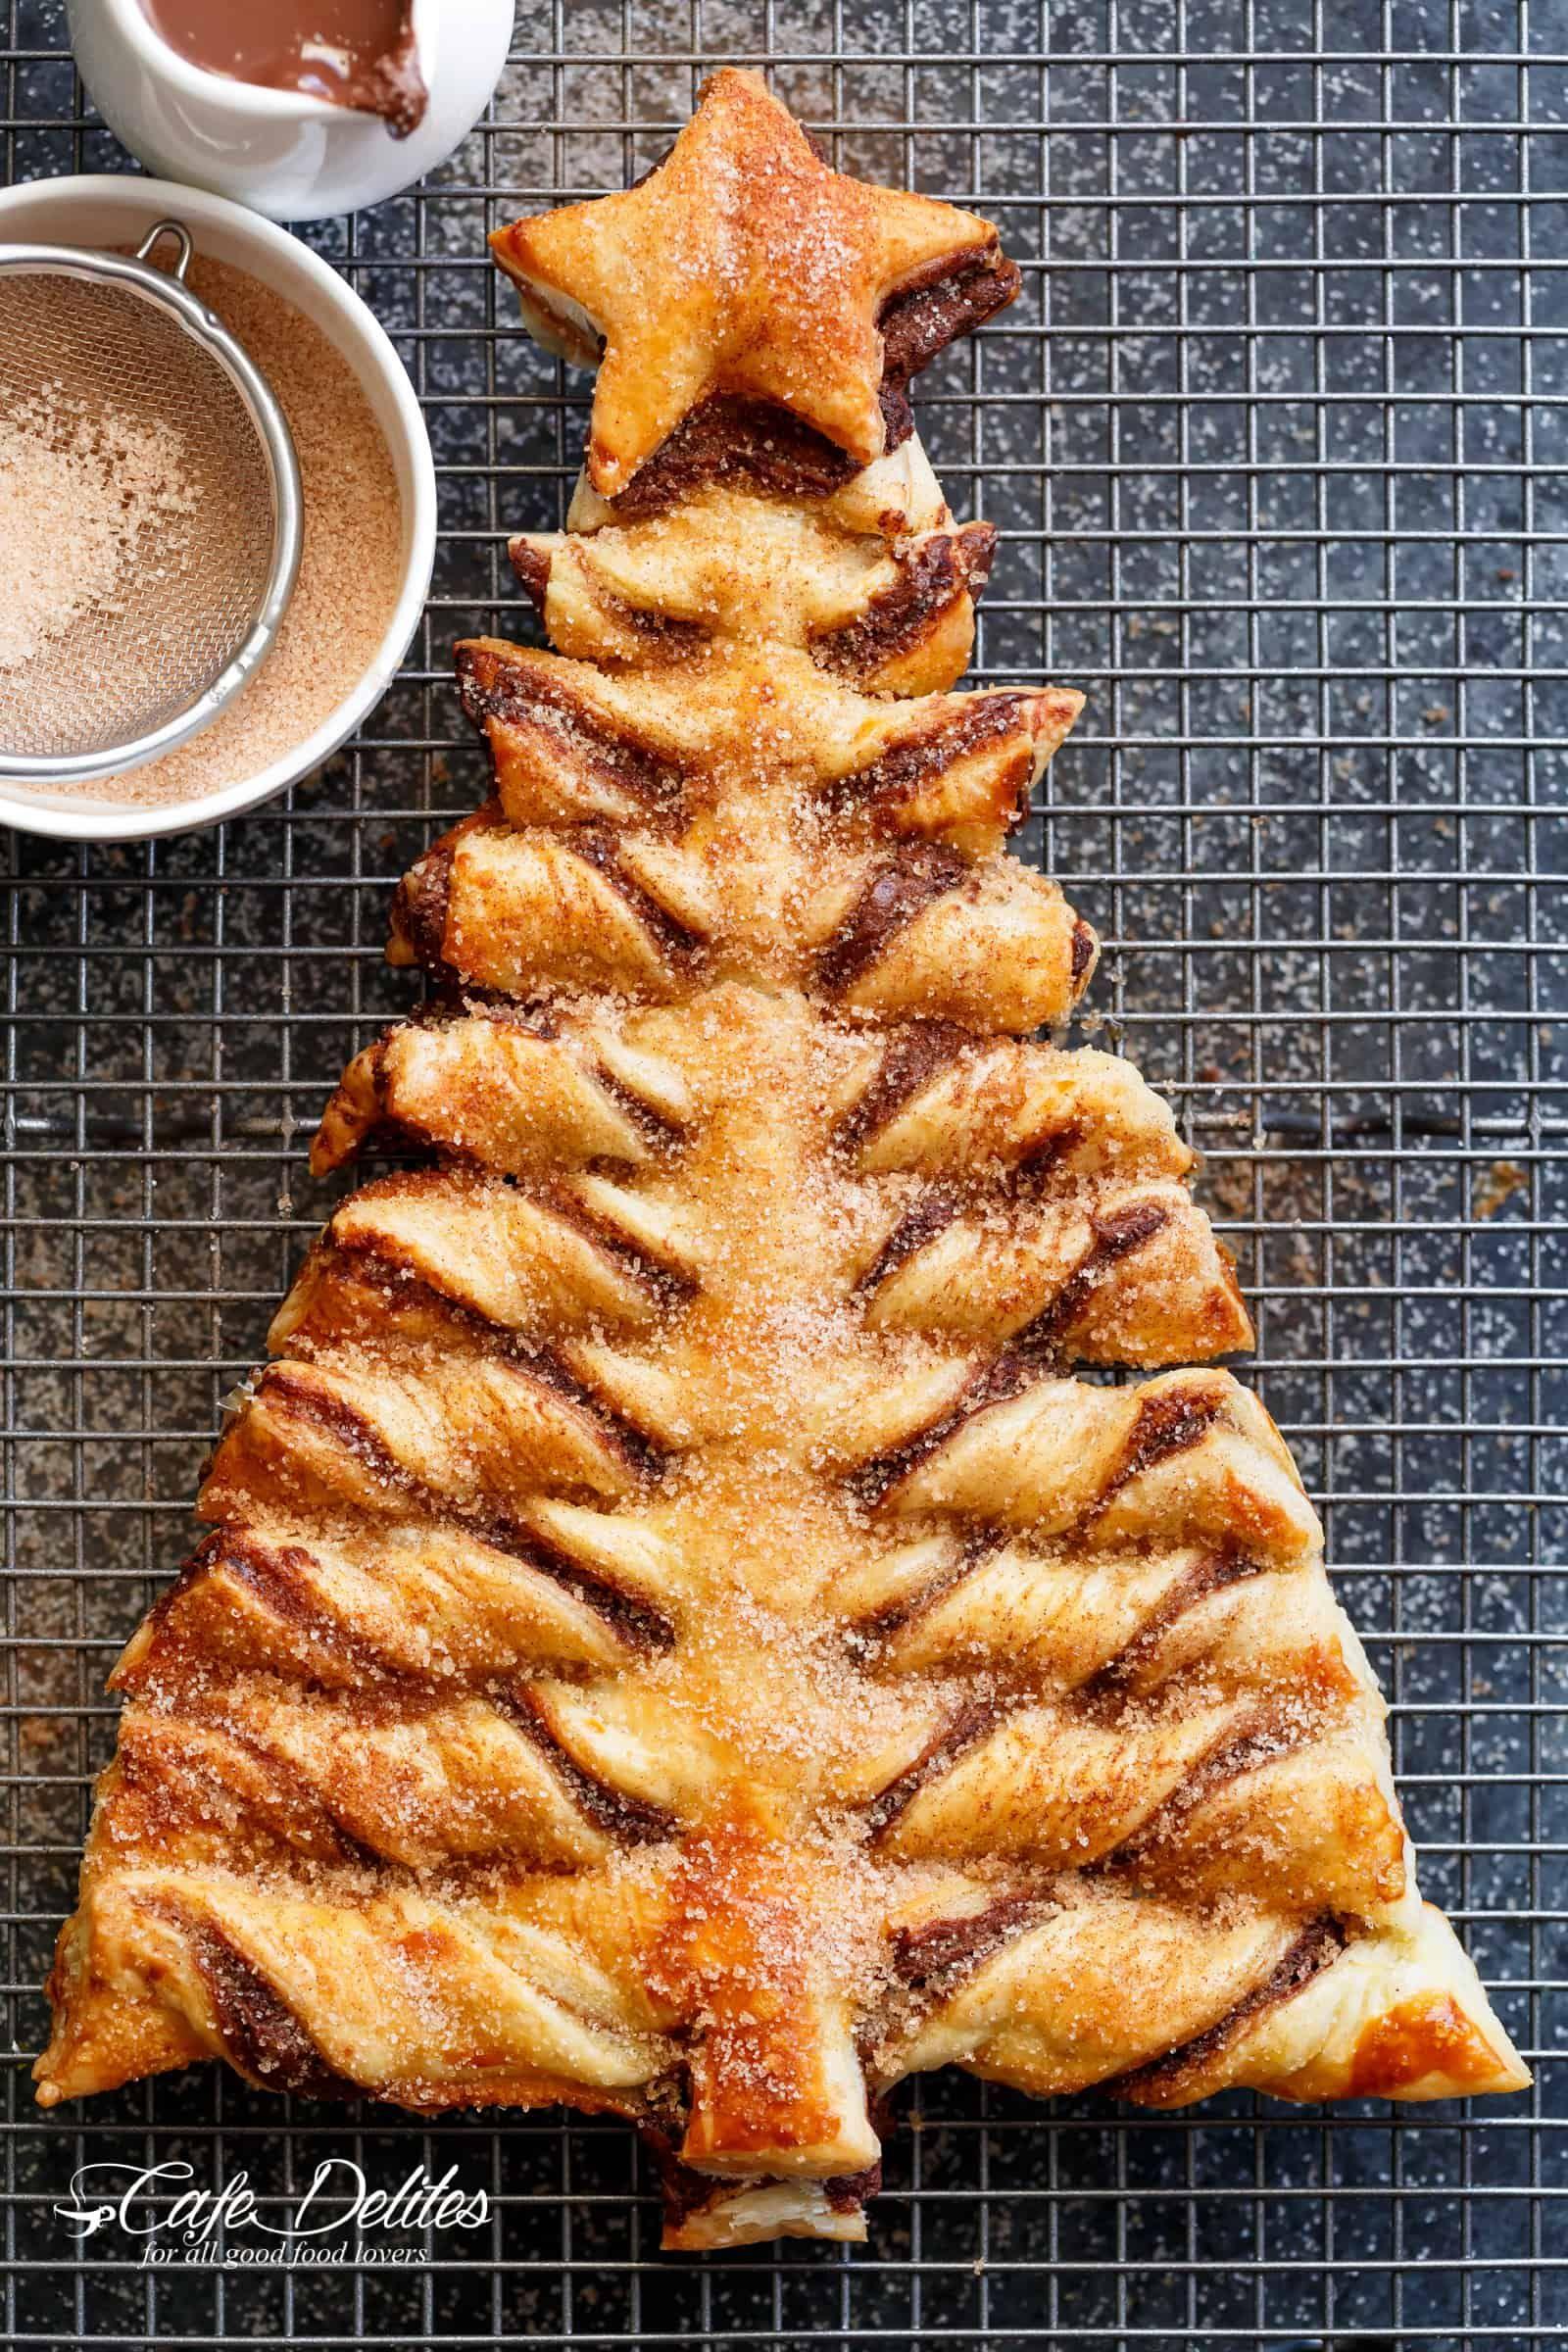 Churro Nutella Christmas Tree Is A Popular Kids Christmas Dessert Pastry Cafe Christmas Desserts Kids Christmas Tree Desserts Christmas Tree Dessert Recipes